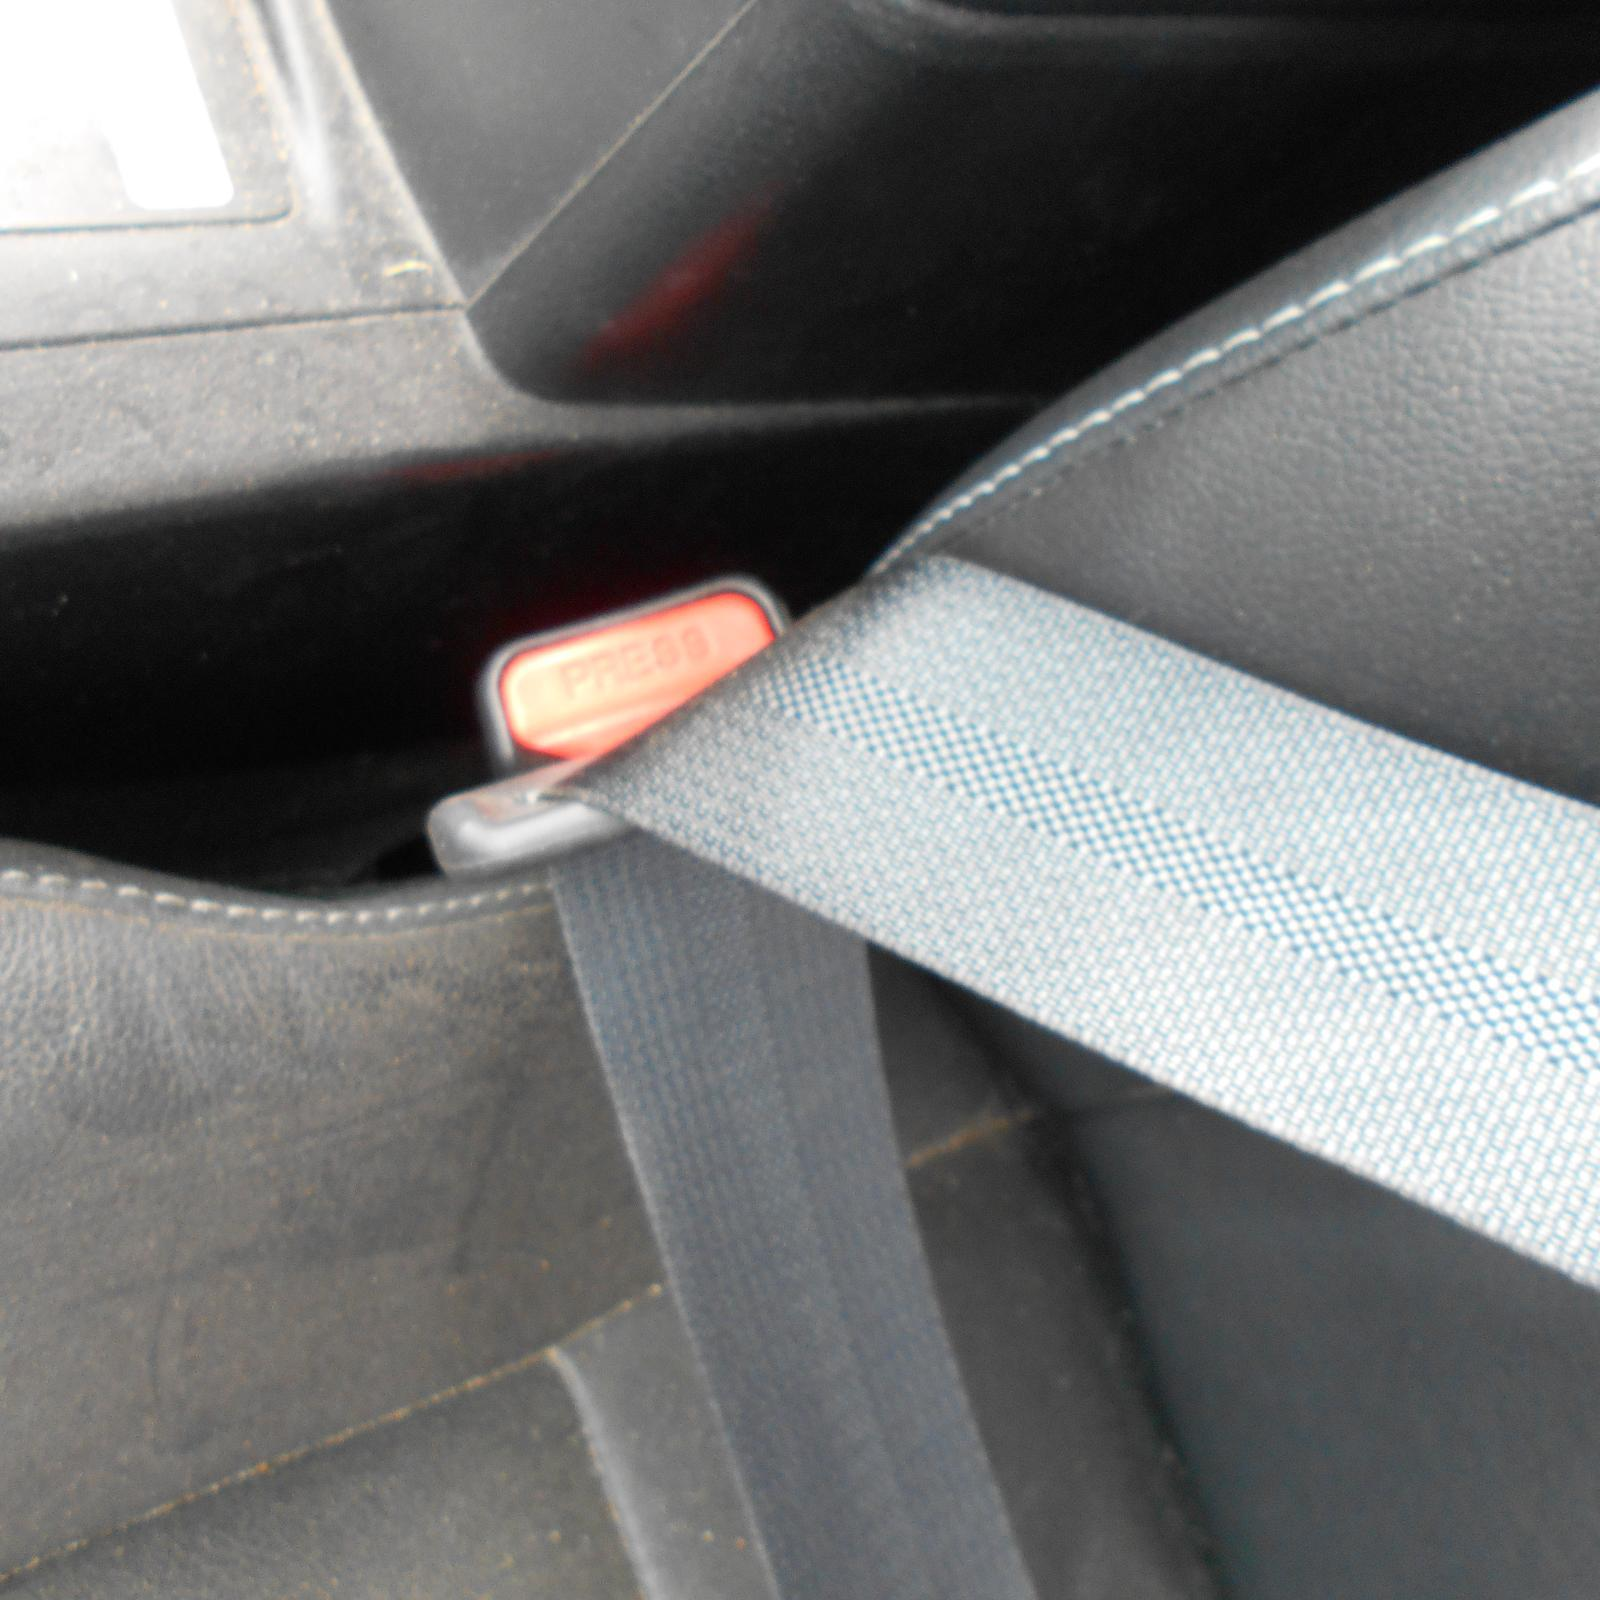 TOYOTA CAMRY, Seatbelt/Stalk, LH FRONT, SEAT BELT ONLY, ASV50/AVV50, 12/11-10/17